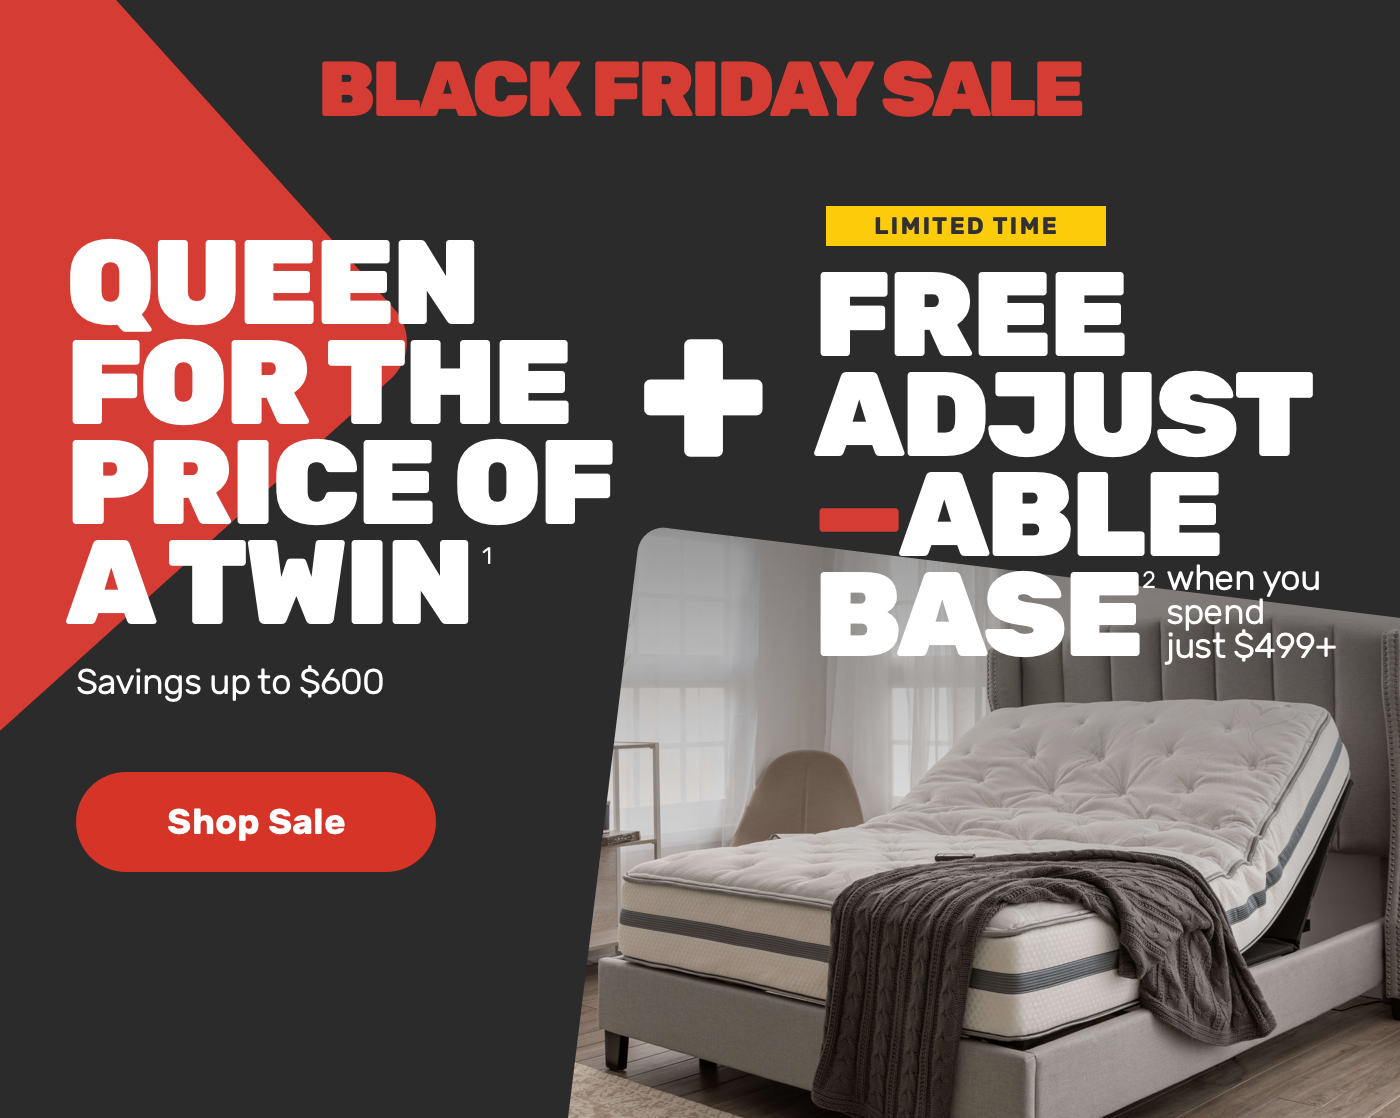 Mattress Firm: Black Friday Sale = the best bed deals!  Milled